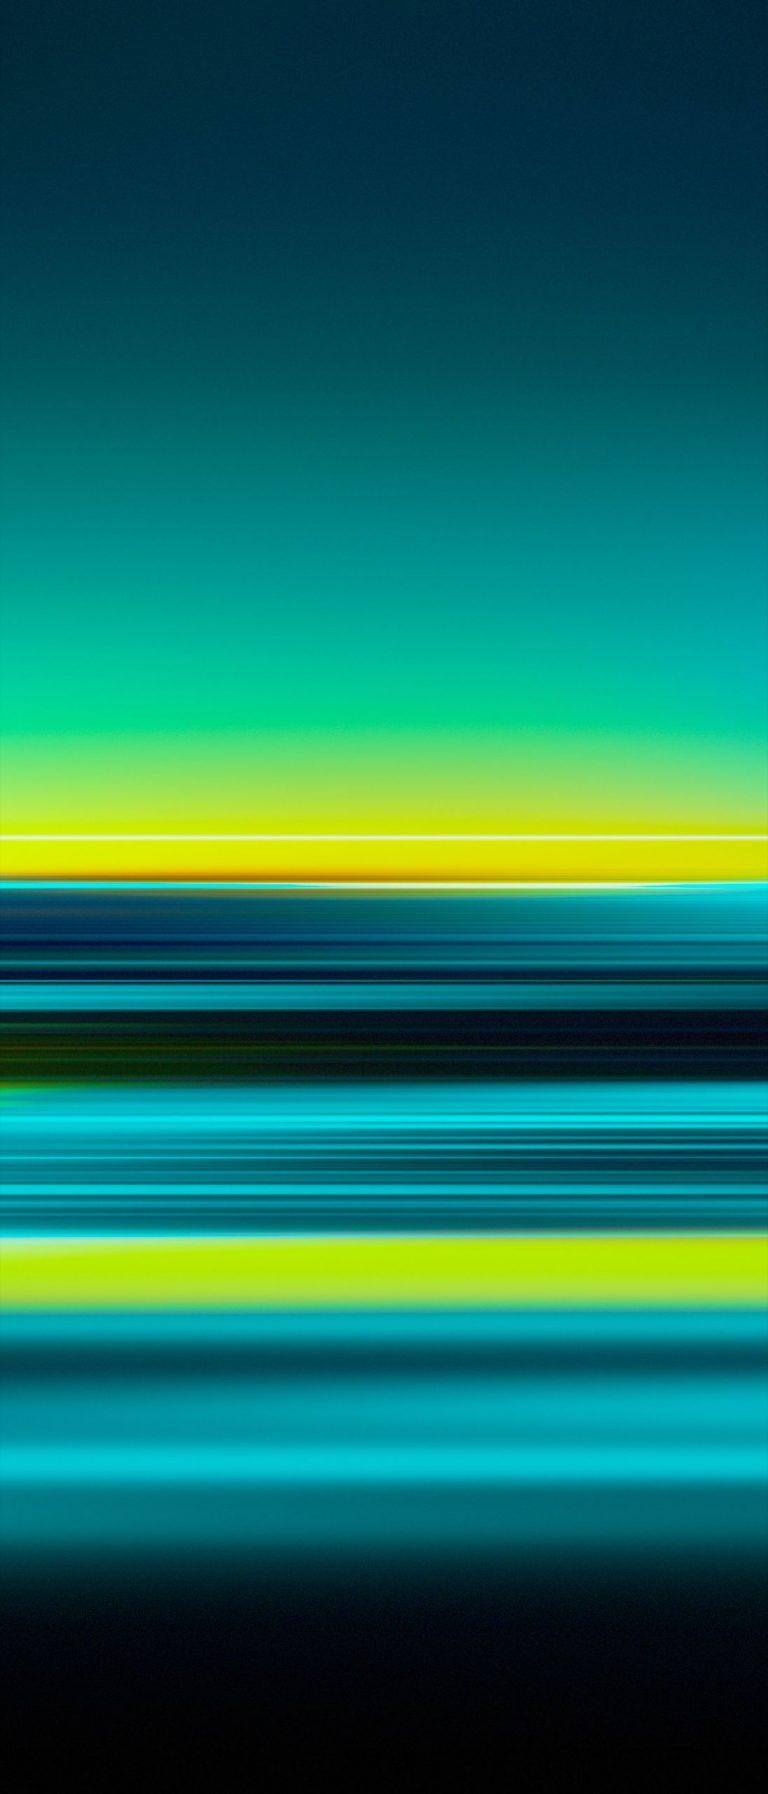 Sony Xperia 5 Stock Wallpaper 06 1096x2560 768x1794